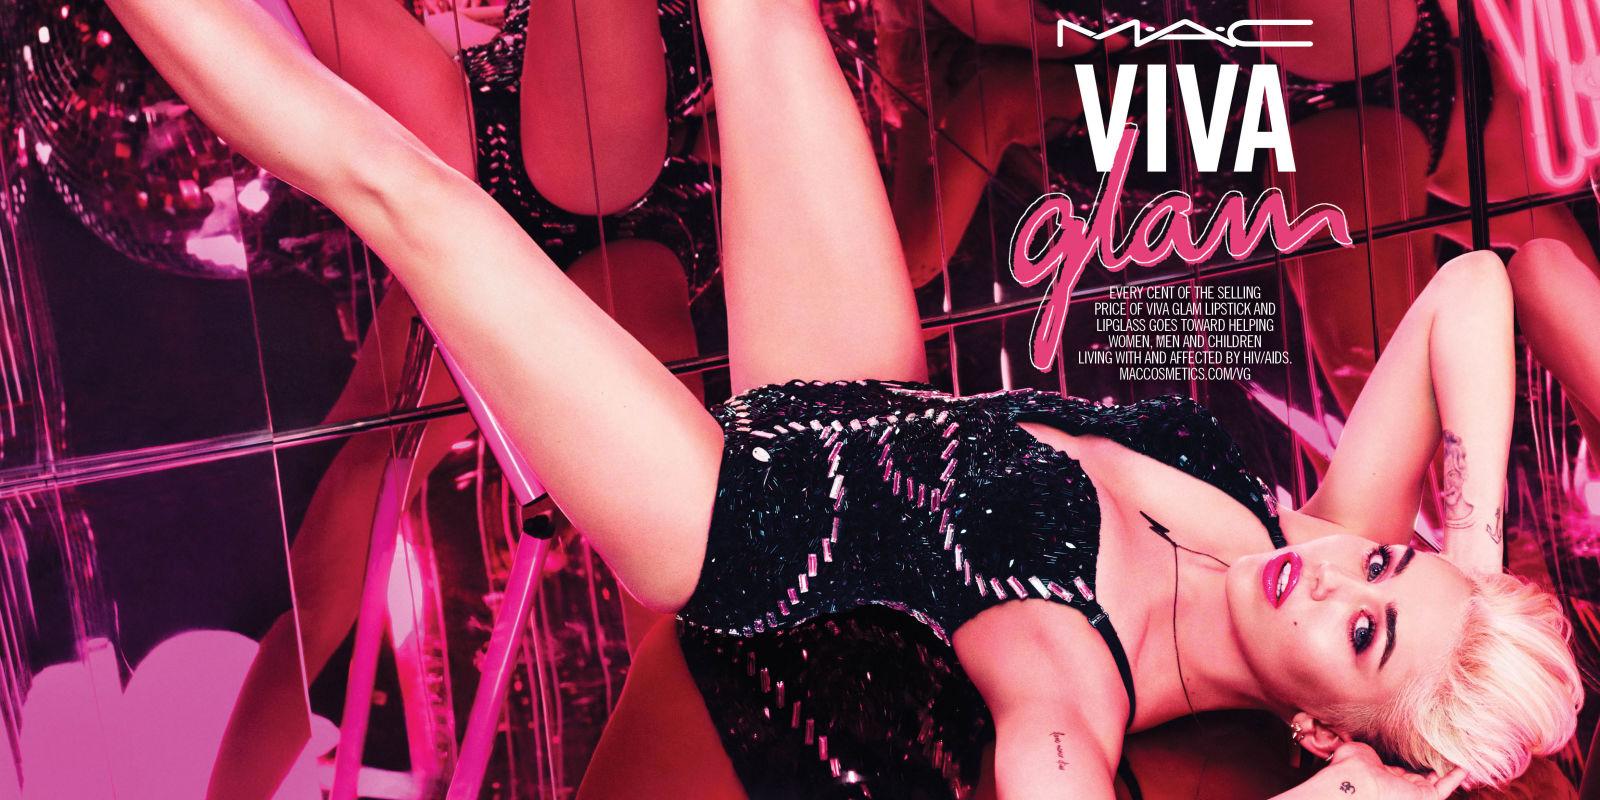 nrm  viva glam miley cyrus spread